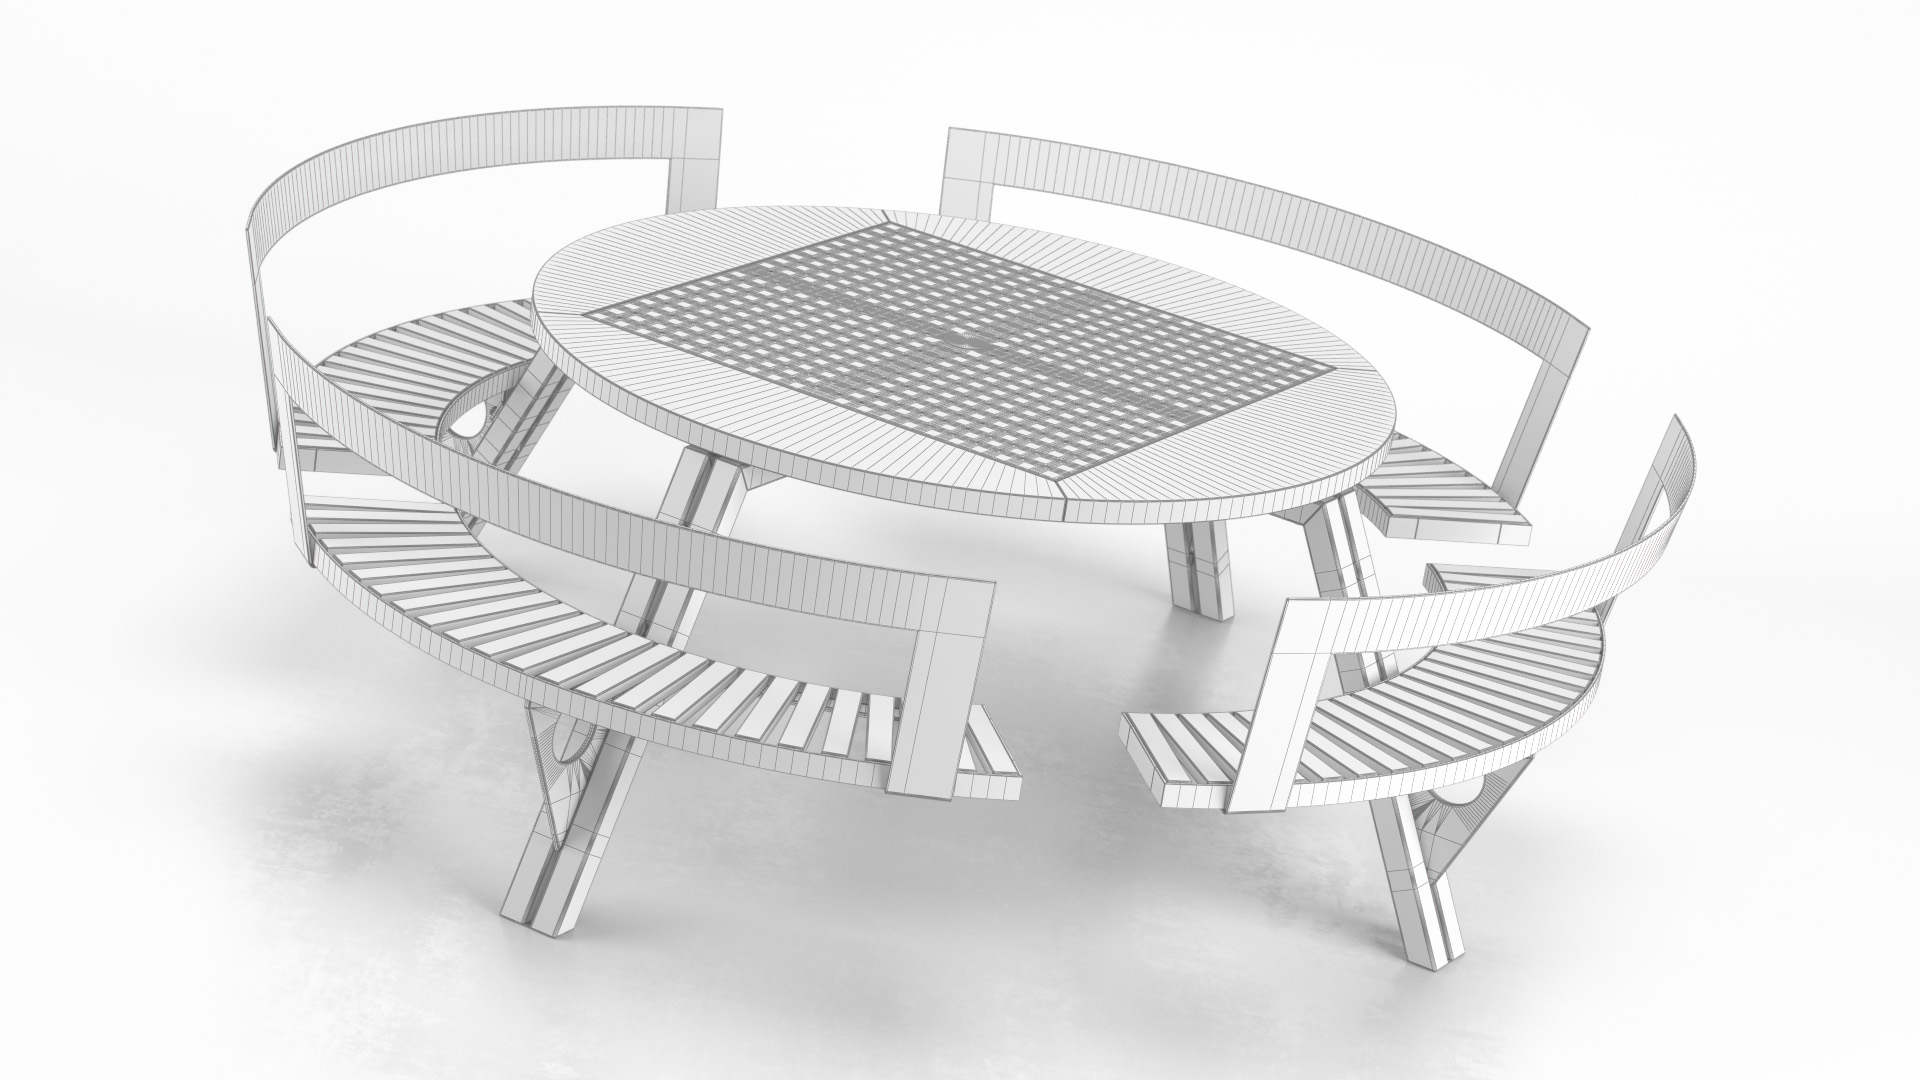 Gargantua_Table_Mode3_WhiteSet_01_wire_0003